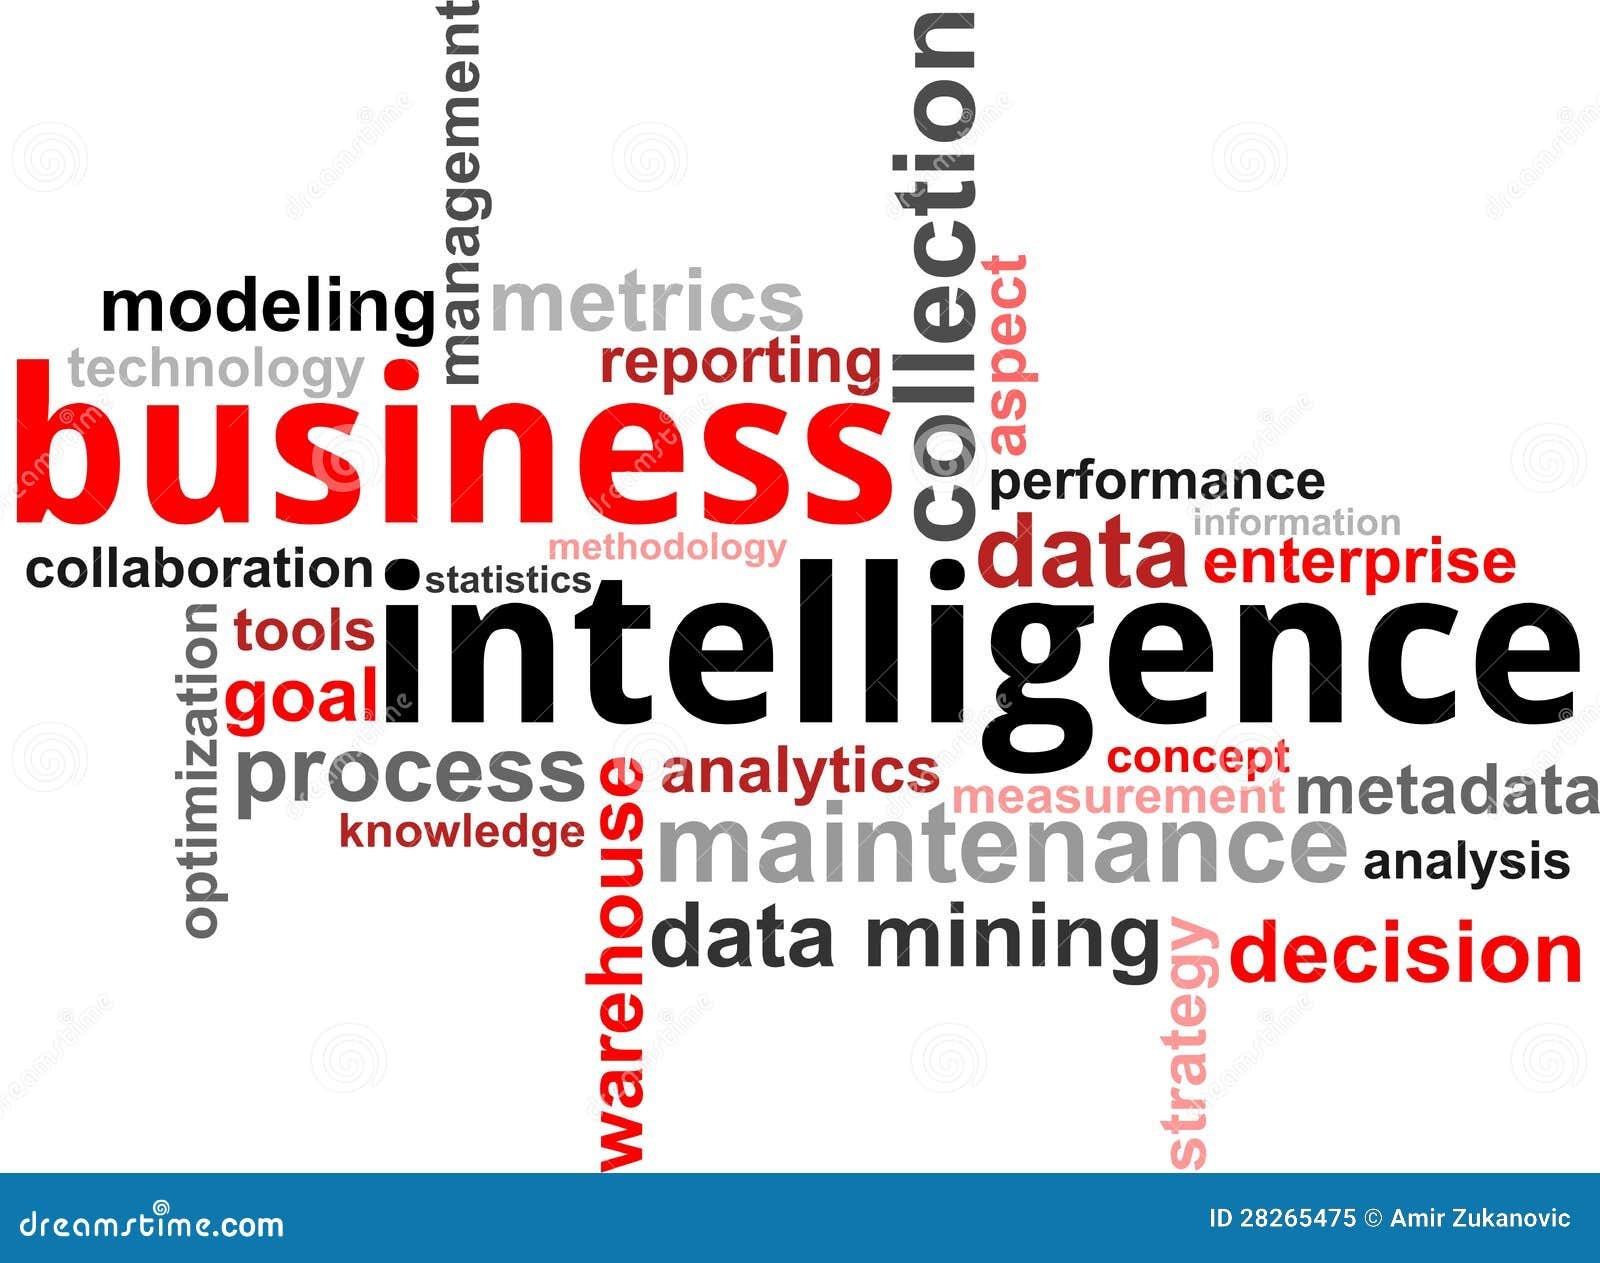 Nuvola di parola - business intelligence